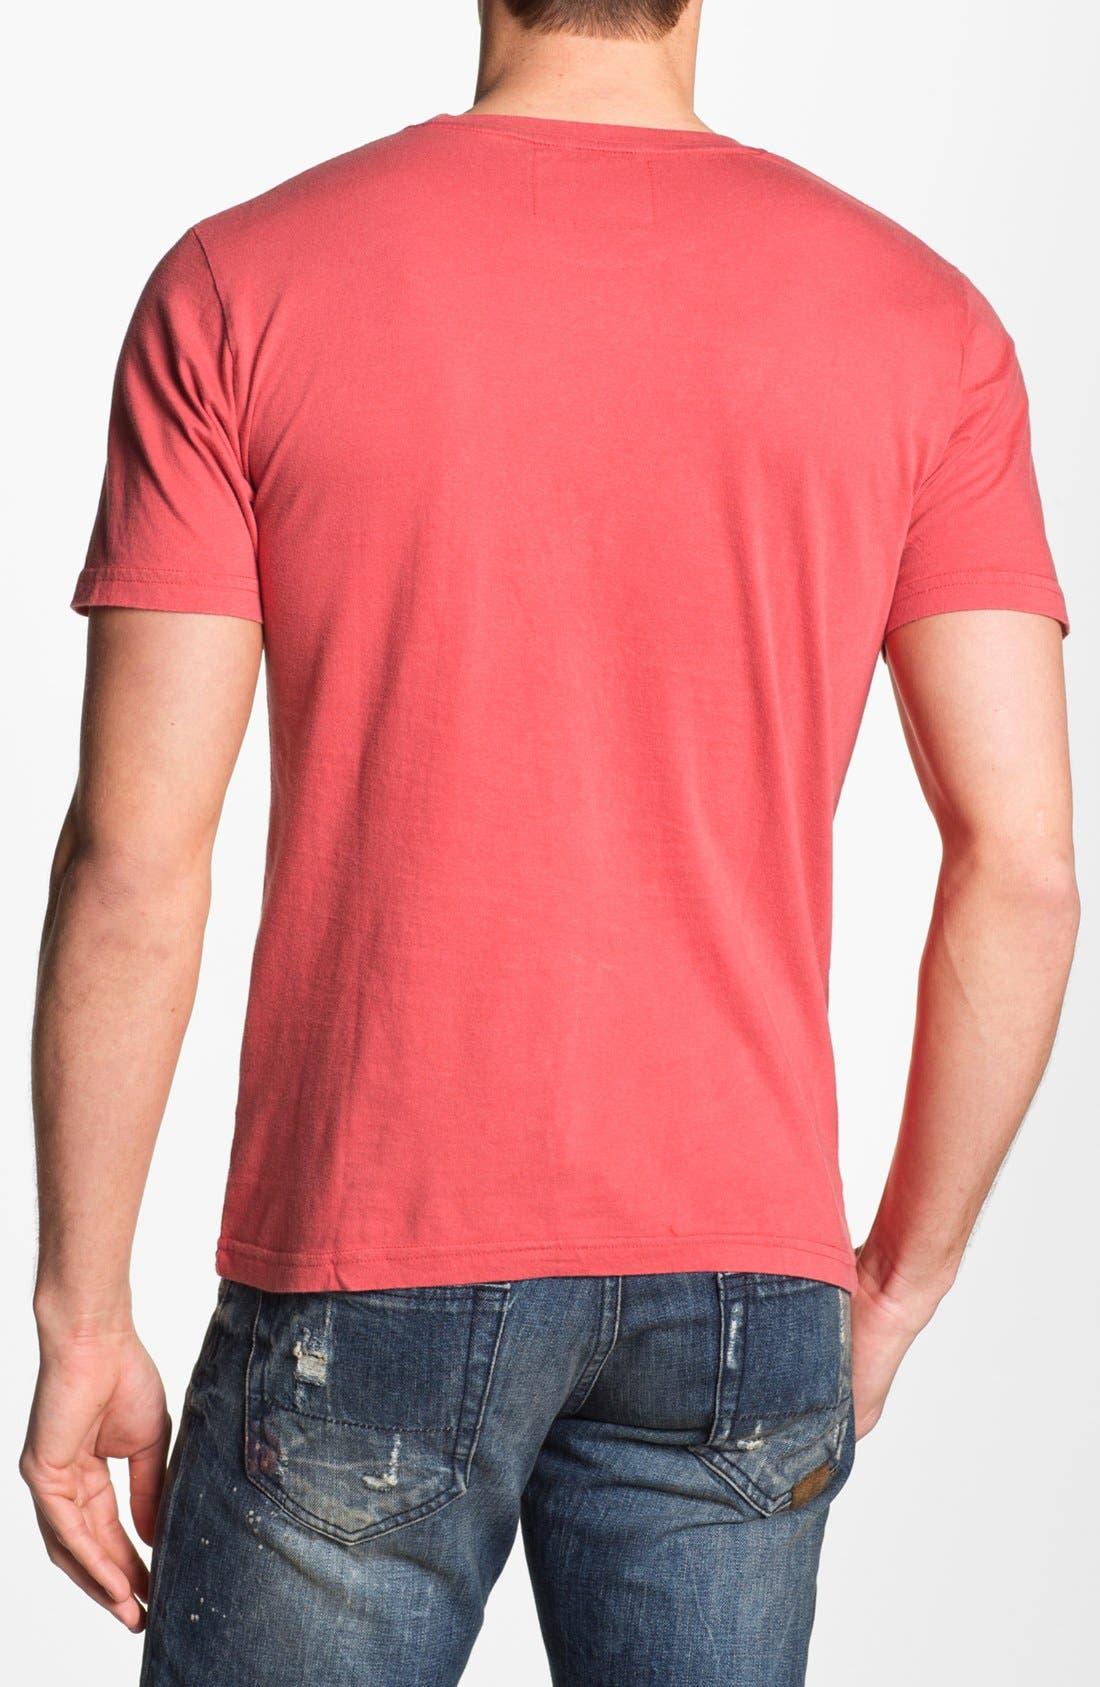 'Texas Rangers' T-Shirt,                             Alternate thumbnail 2, color,                             600